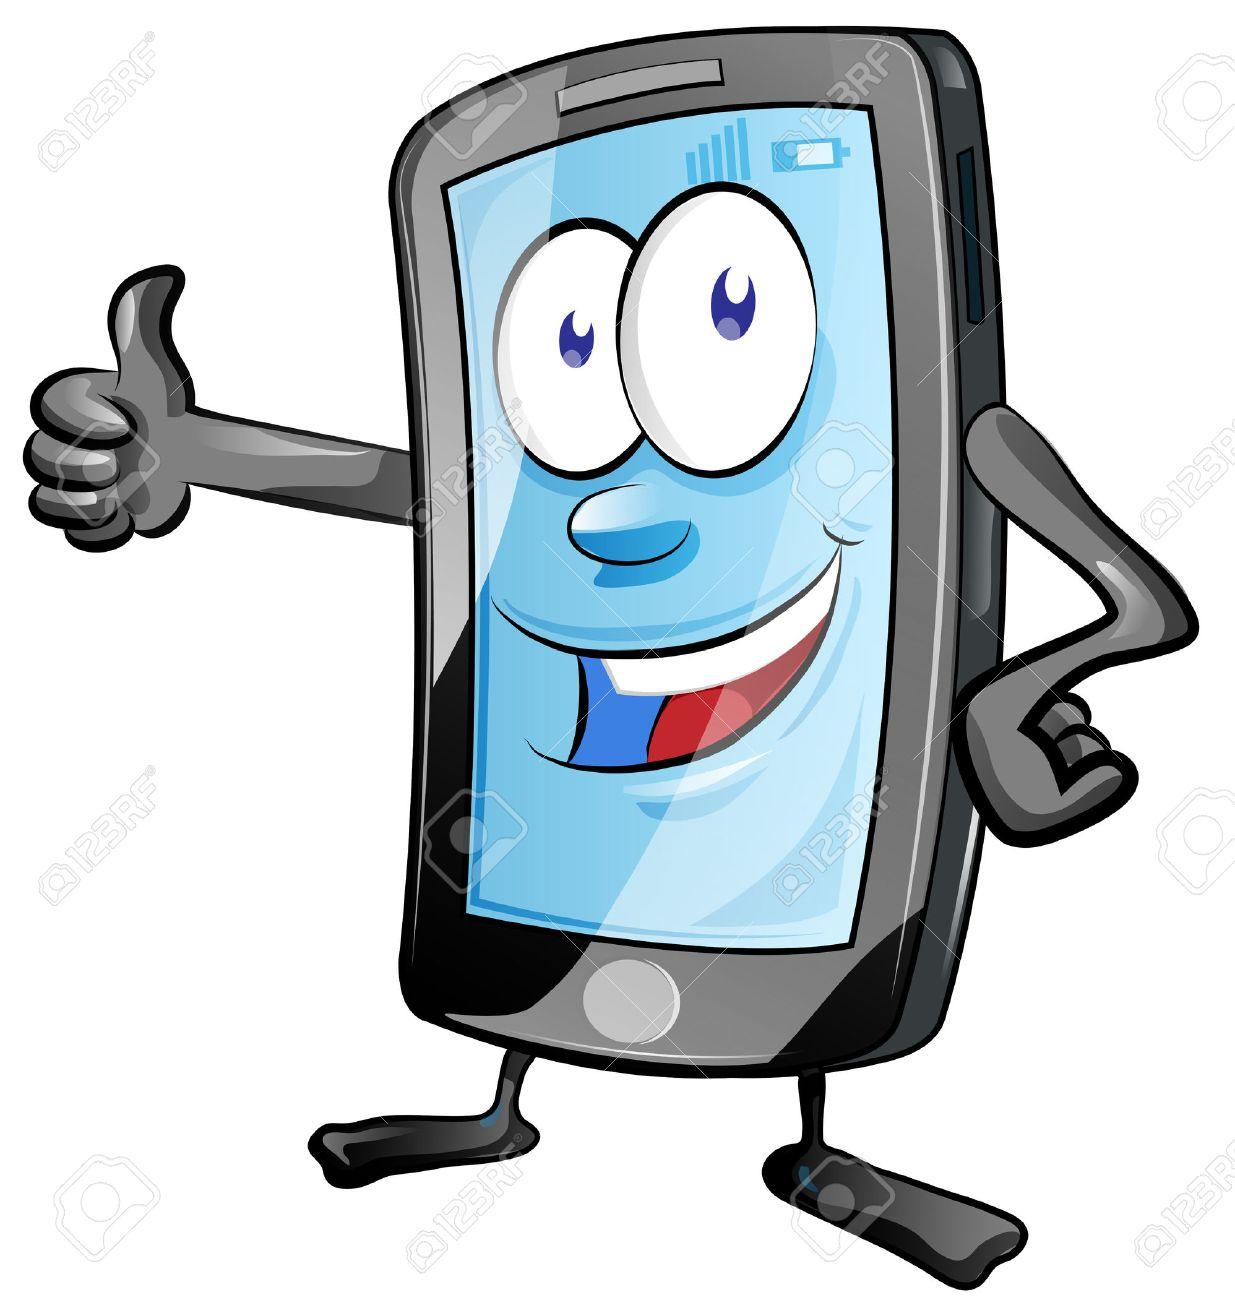 1235x1300 Telephone Cartoon Stock Photos. Royalty Free Telephone Cartoon